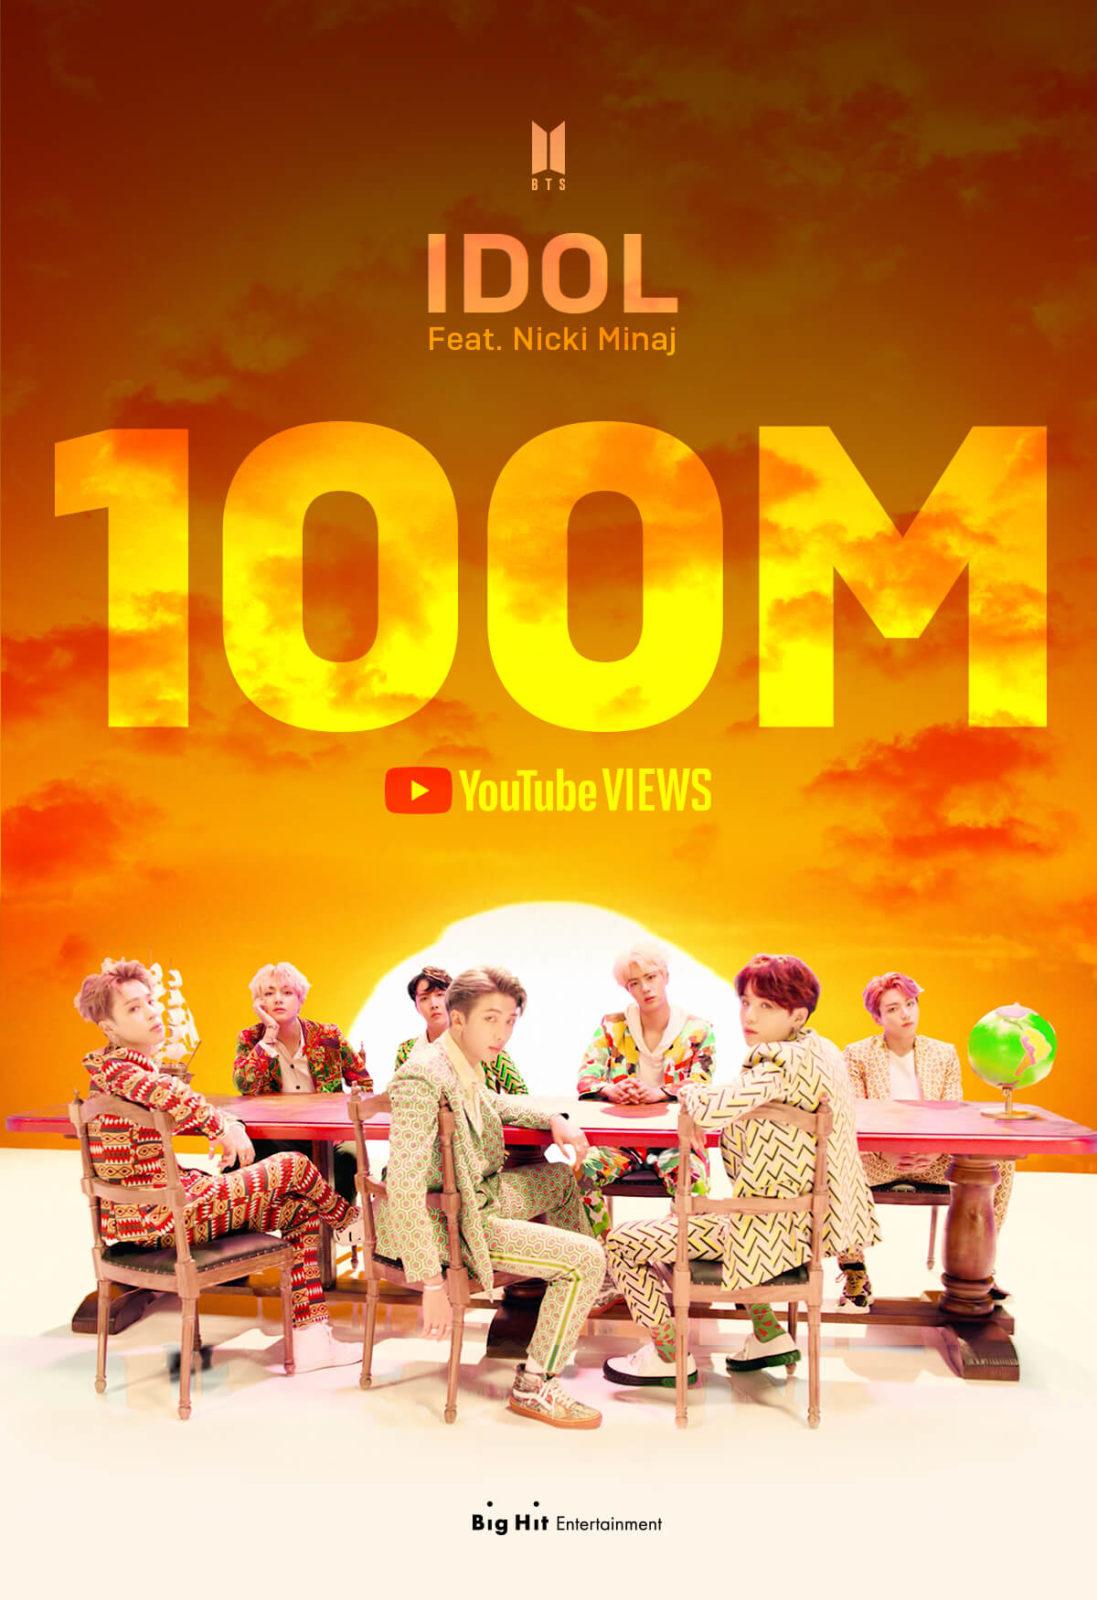 BTS、Nicki Minajフィーチャリング「IDOL」と「Black Swan」MVがそれぞれ1億再生突破サムネイル画像